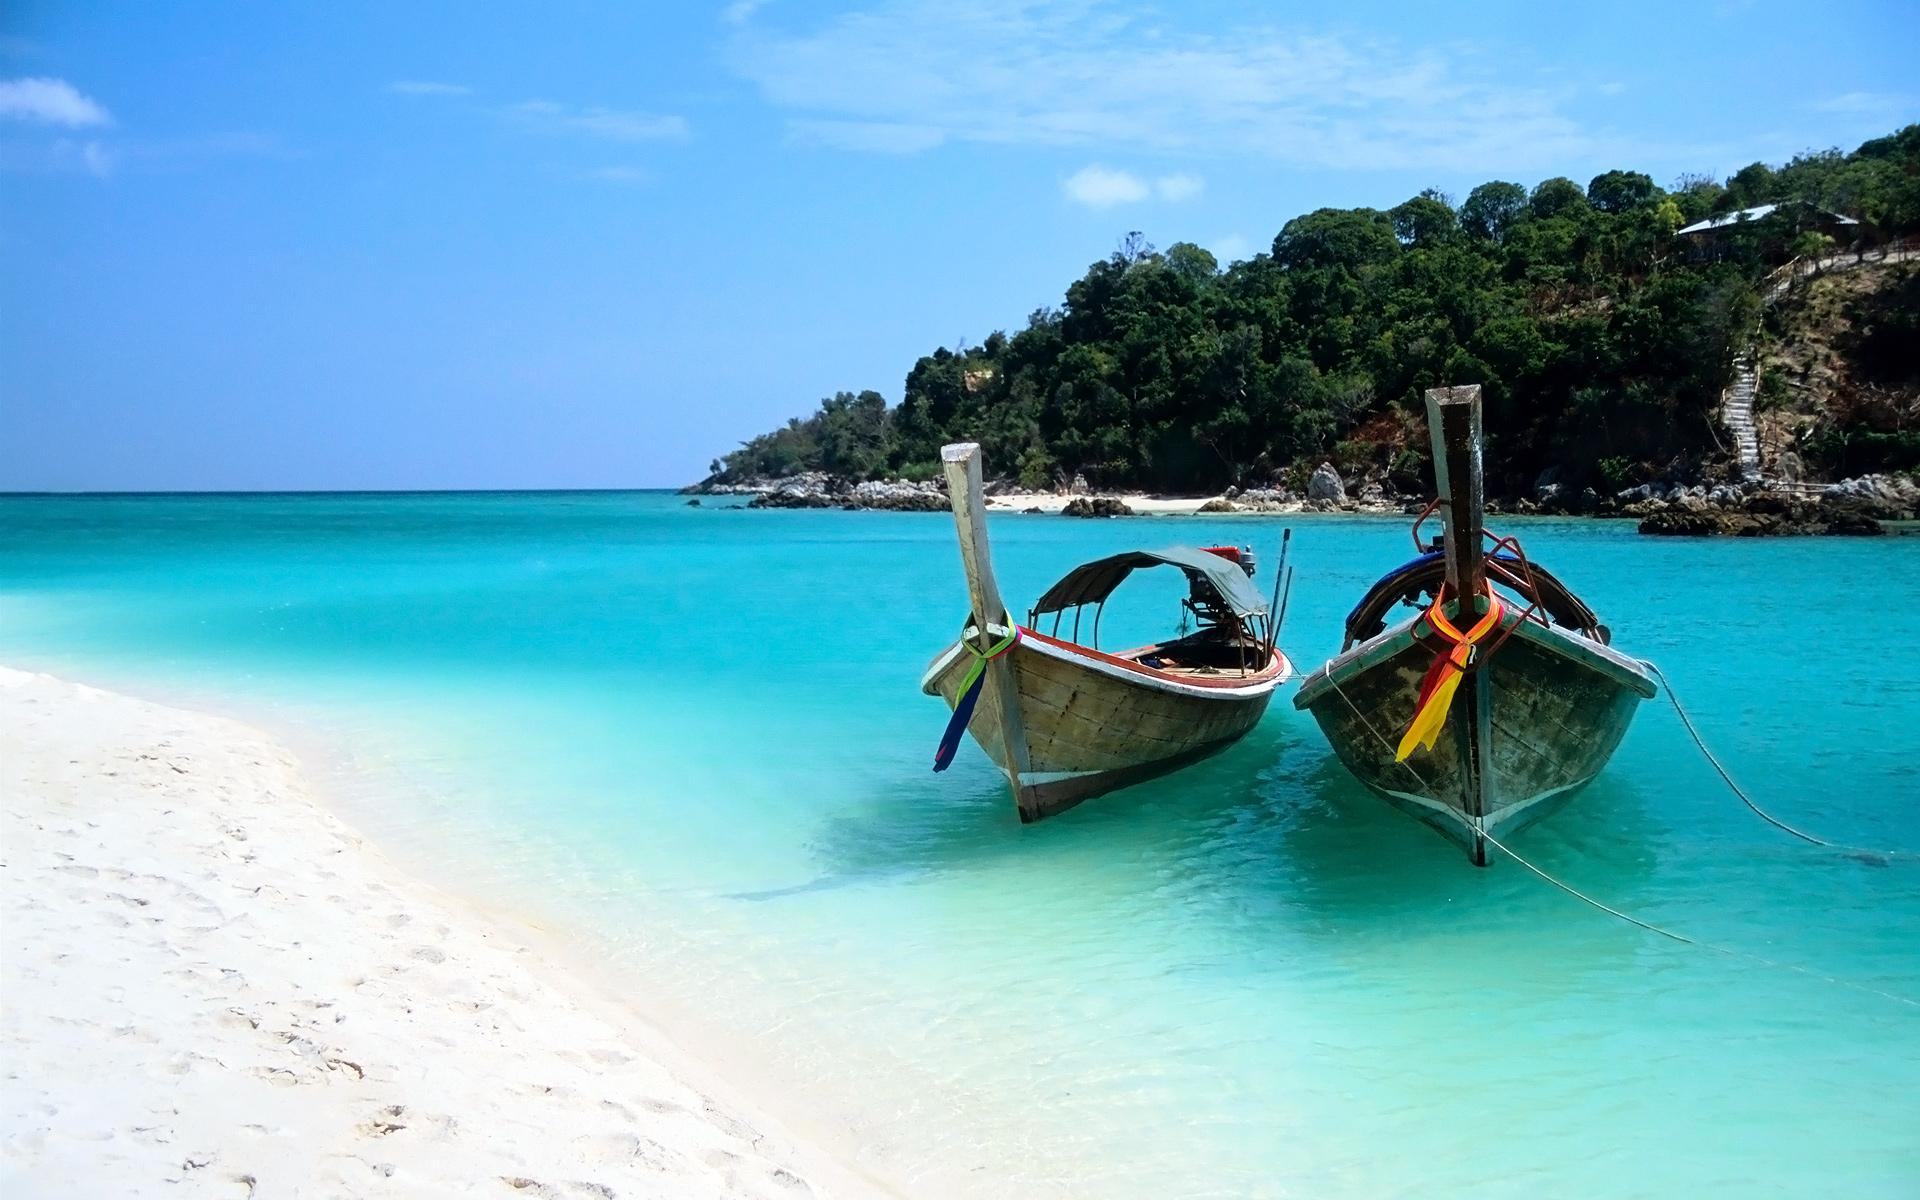 Desktop Wallpaper Beach Thailand Thailand Beaches Wallpaper 1920x1200